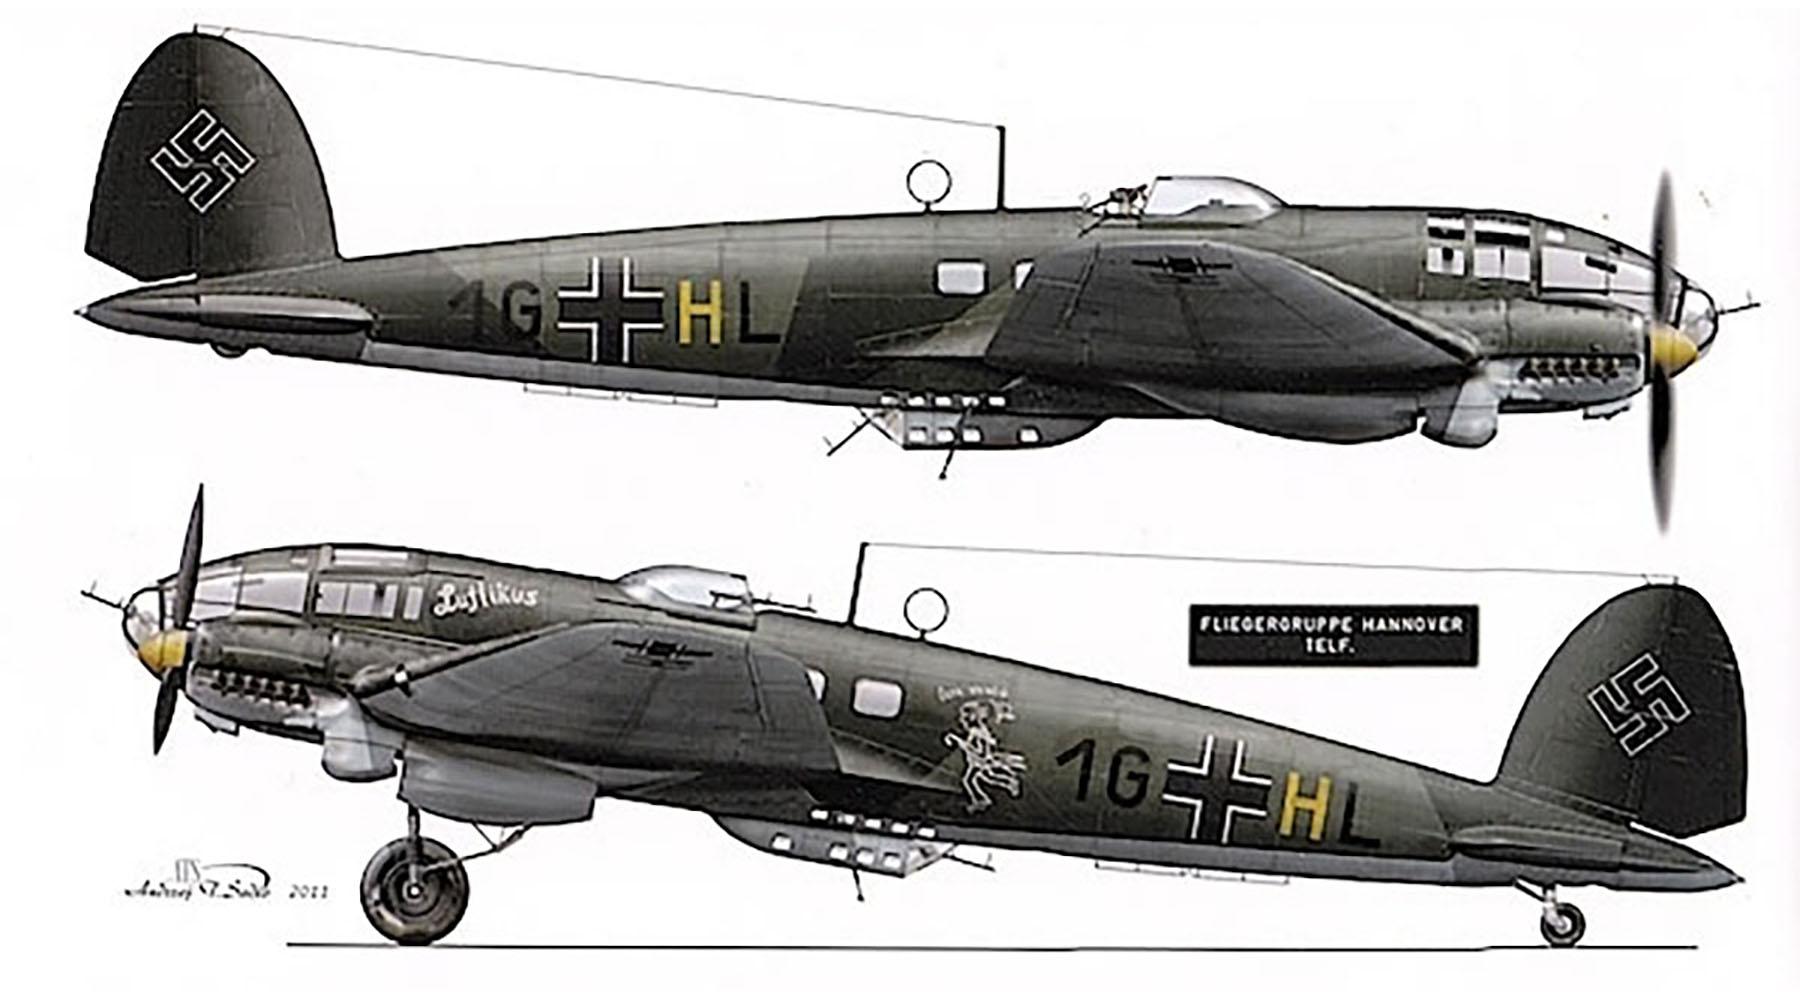 Heinkel He 111P2 3.KG27 1G+HL Luftikus Neukuhren Prussia Sep 1939 0A